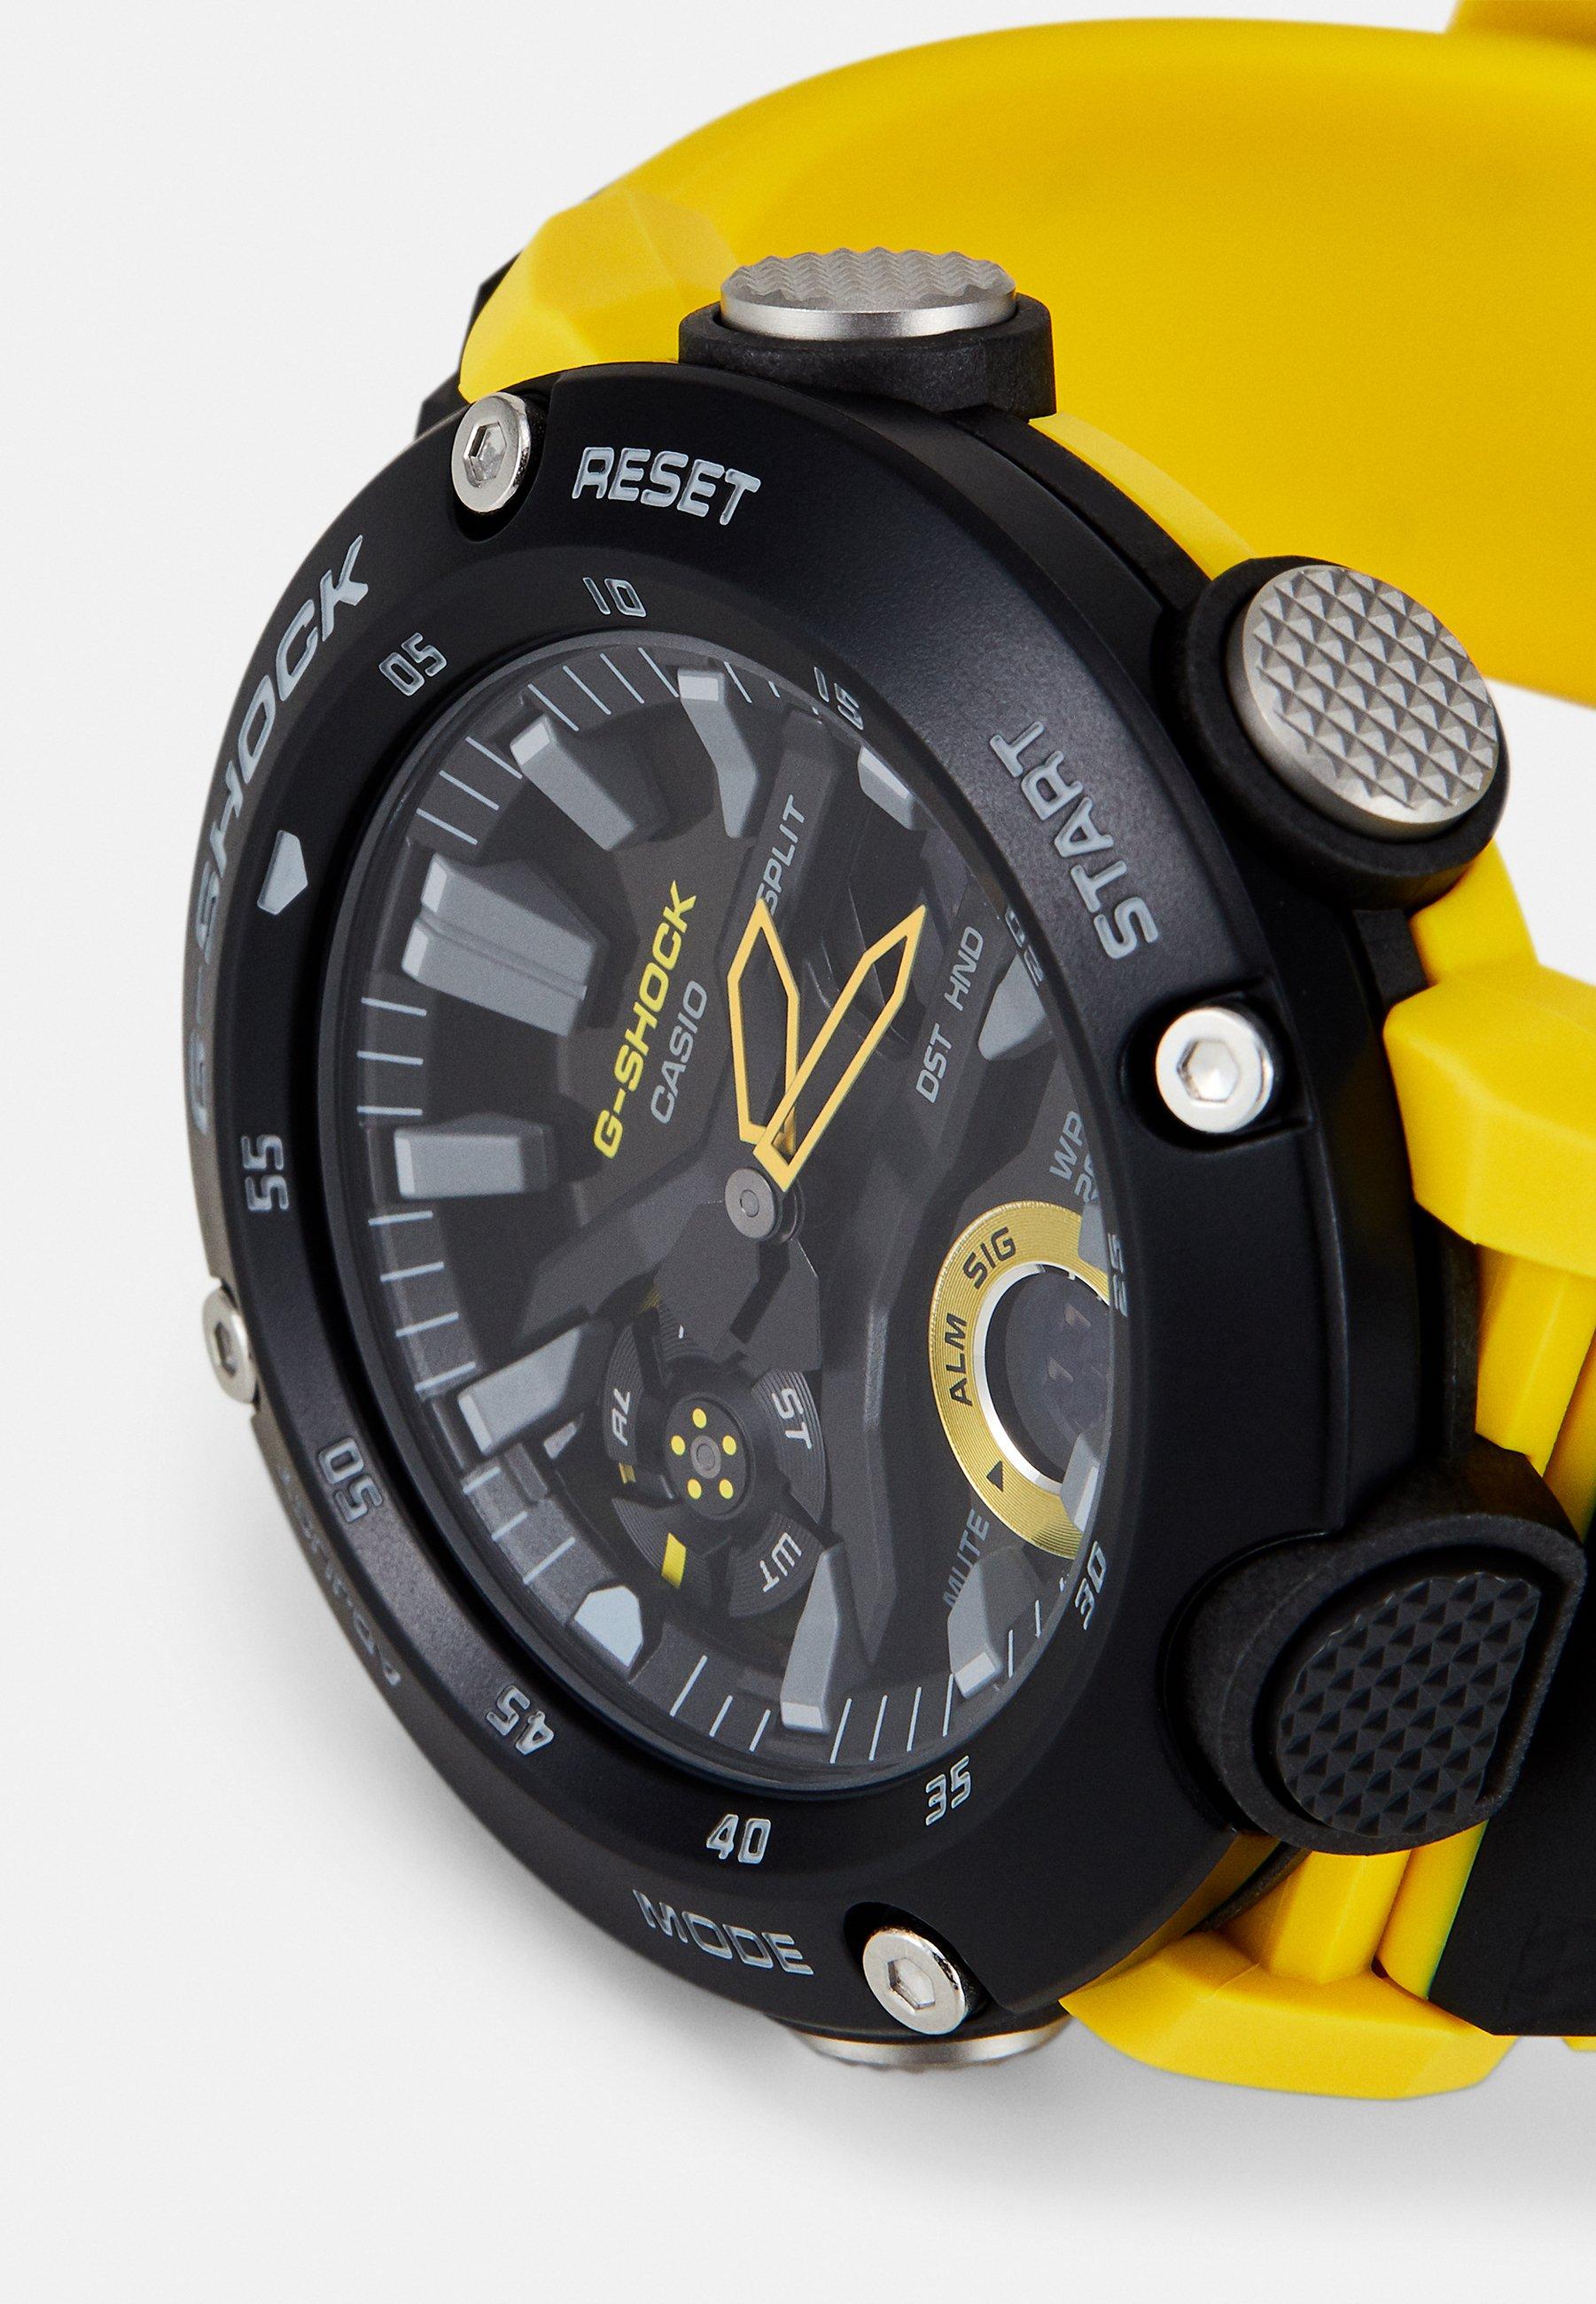 G-SHOCK Kronografklokke - black/yellow/svart H1KMHdAZr3GNBq7